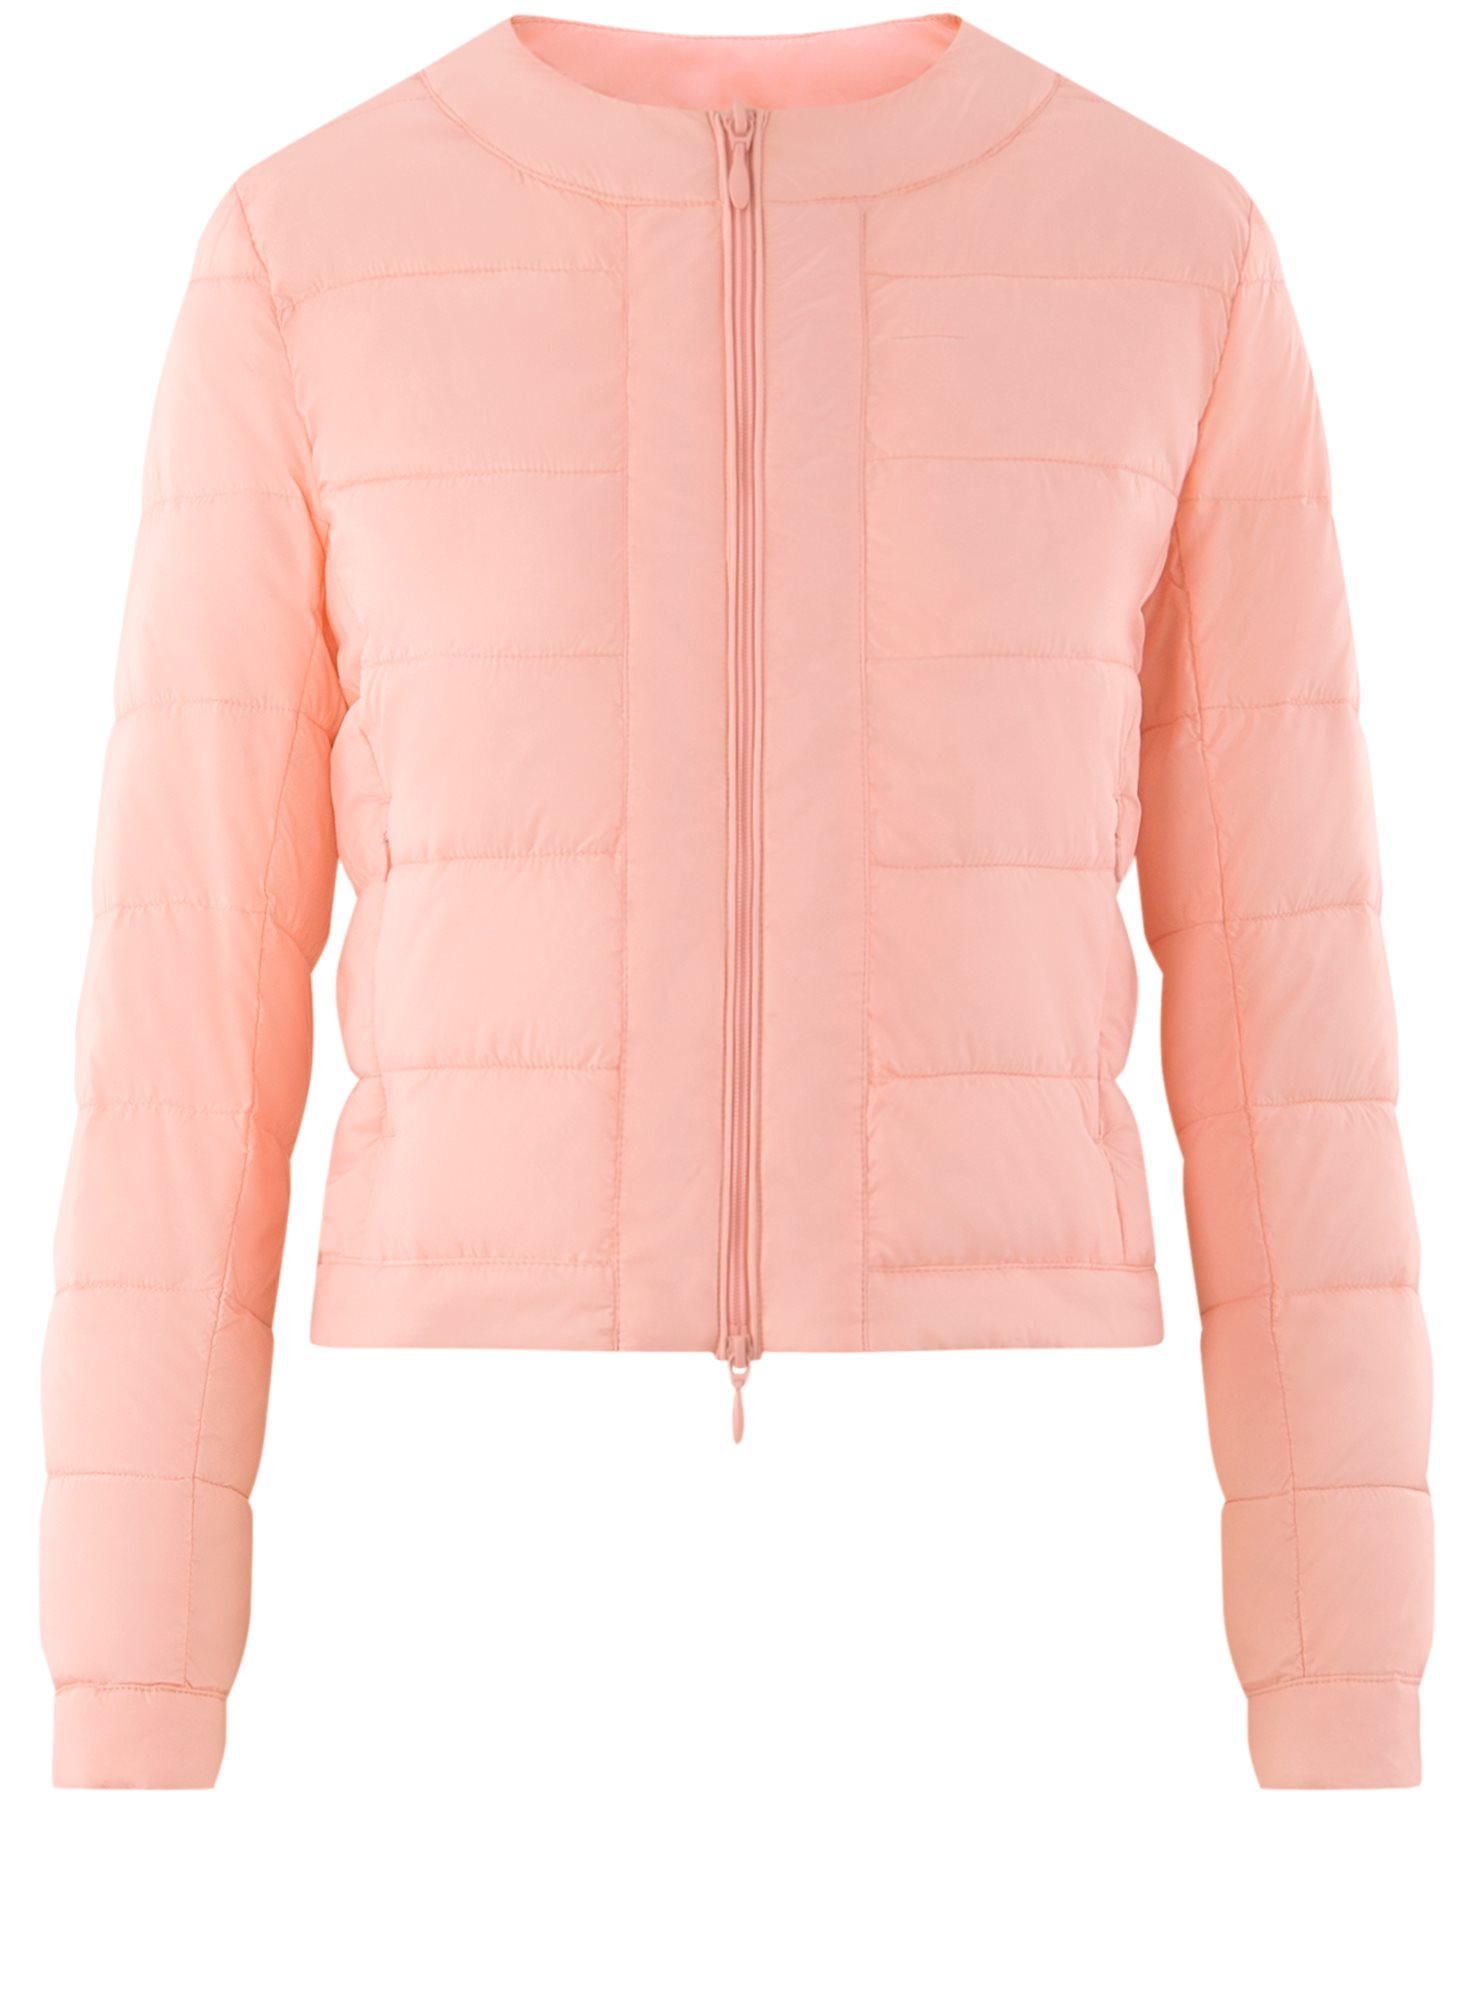 Куртка стеганая с круглым вырезом oodji для женщины (розовый), 10203050-2B/47020/4001N